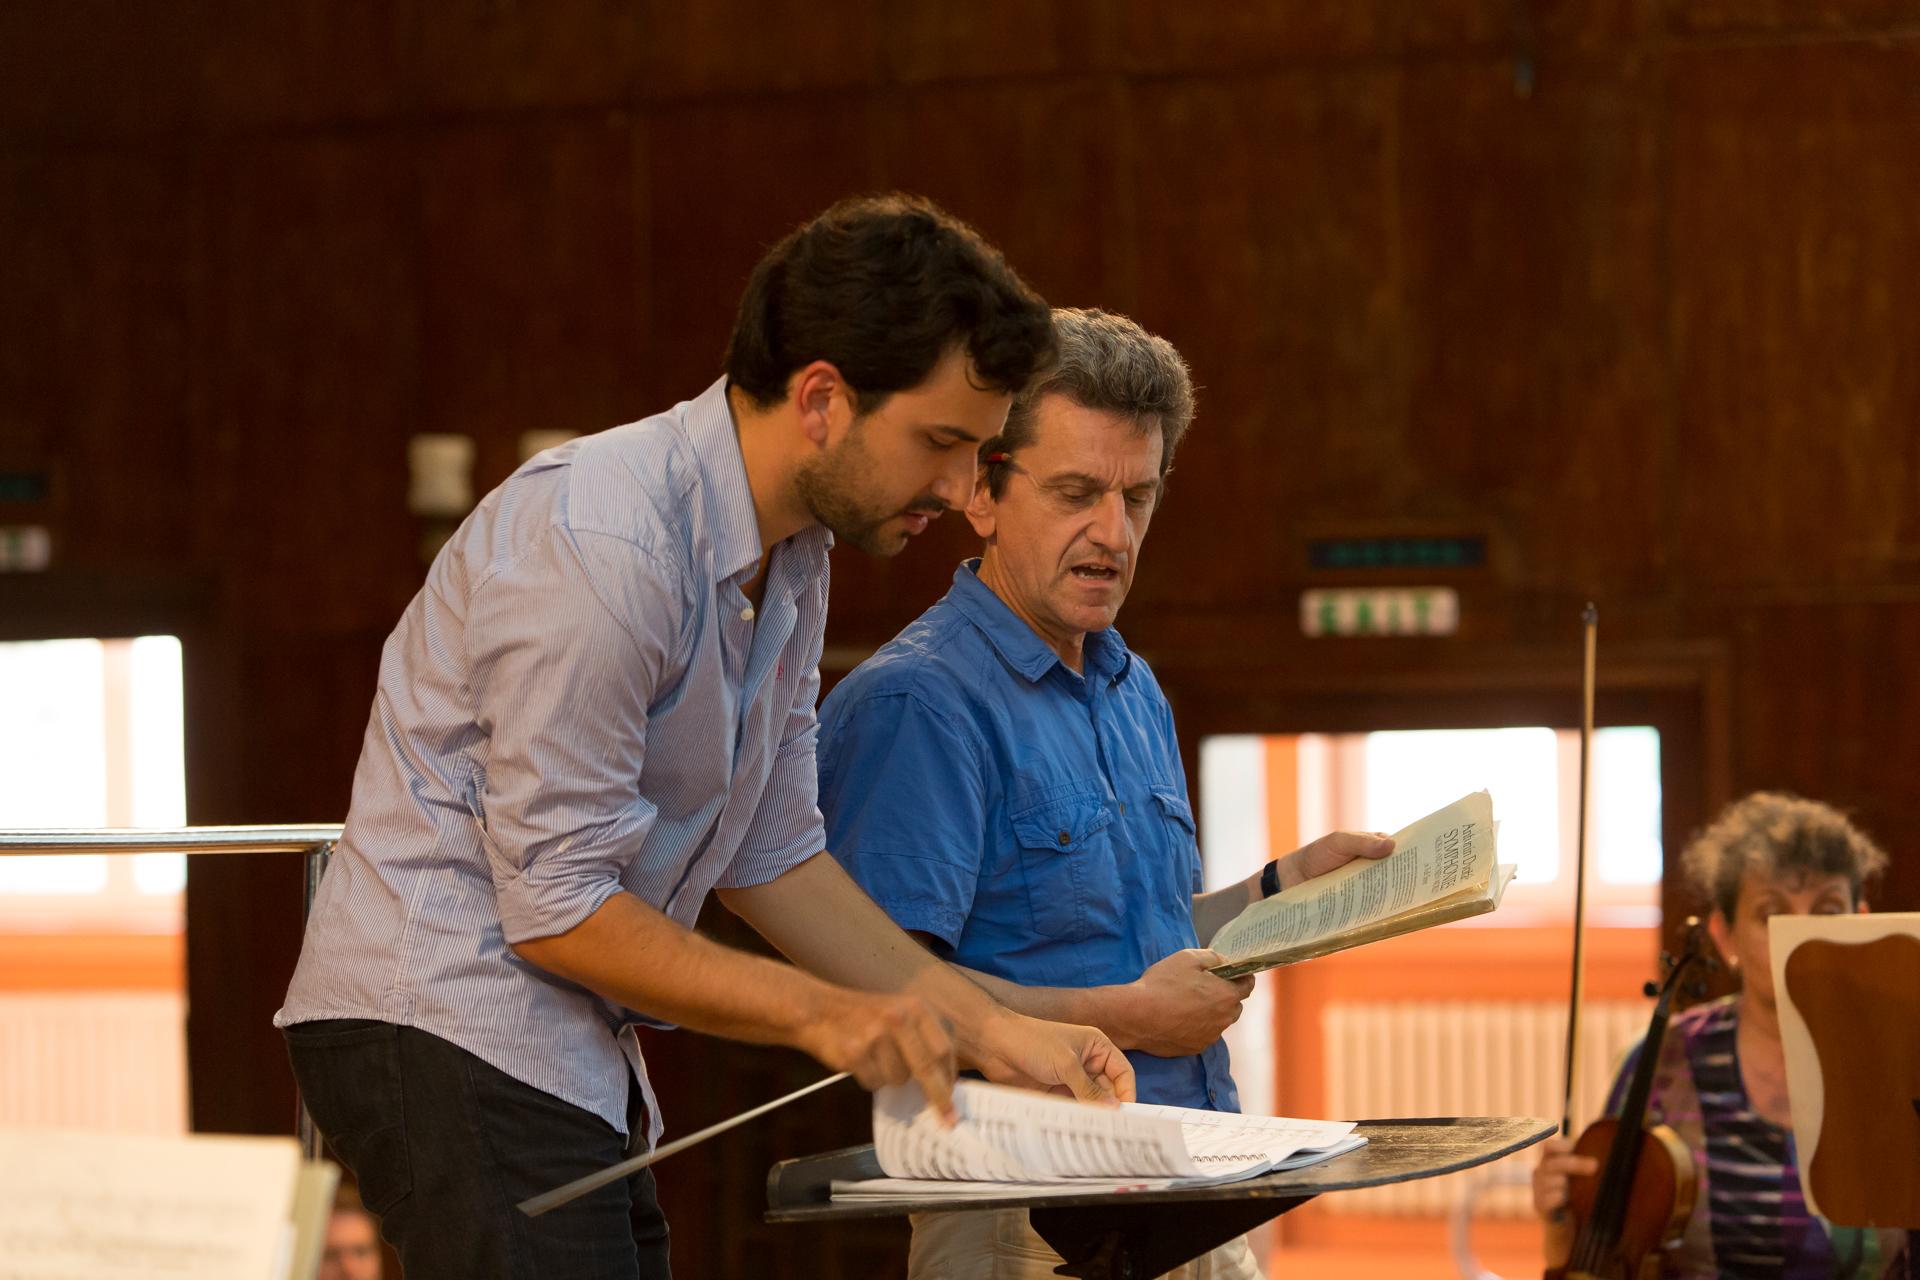 With Maestro Johannes Schlaefli